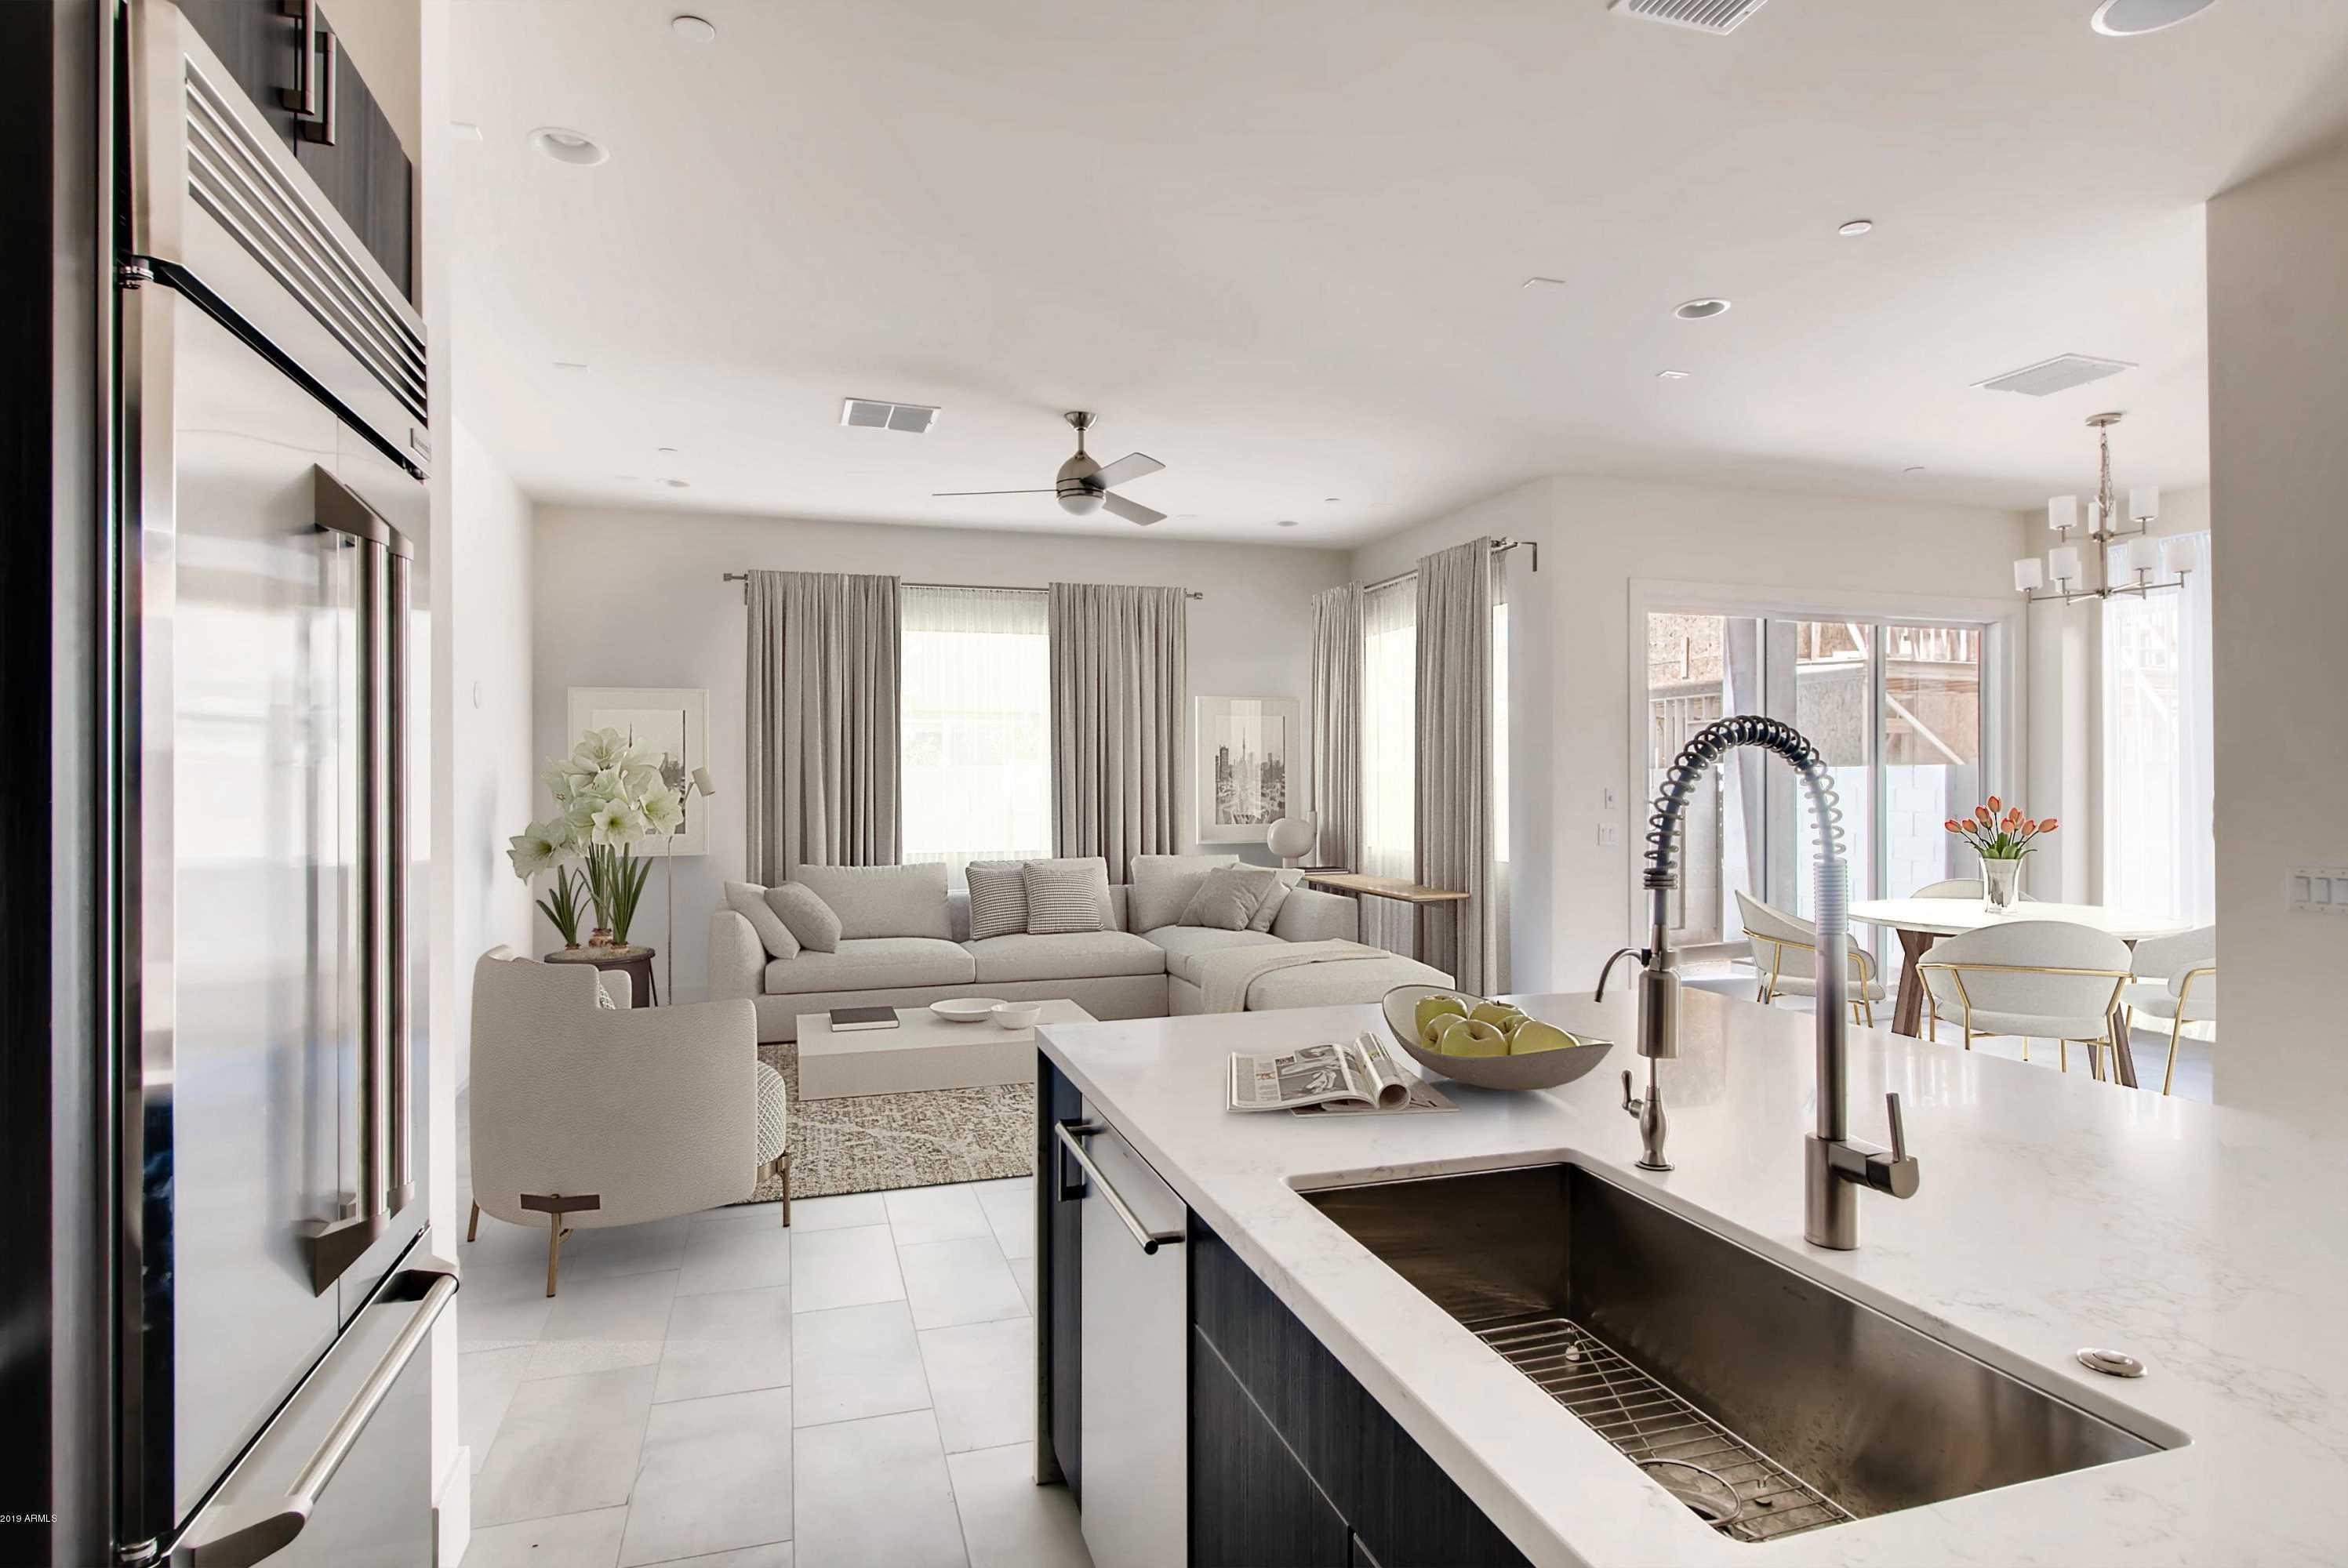 $749,900 - 3Br/3Ba - Home for Sale in Skye On Mcdowell, Scottsdale